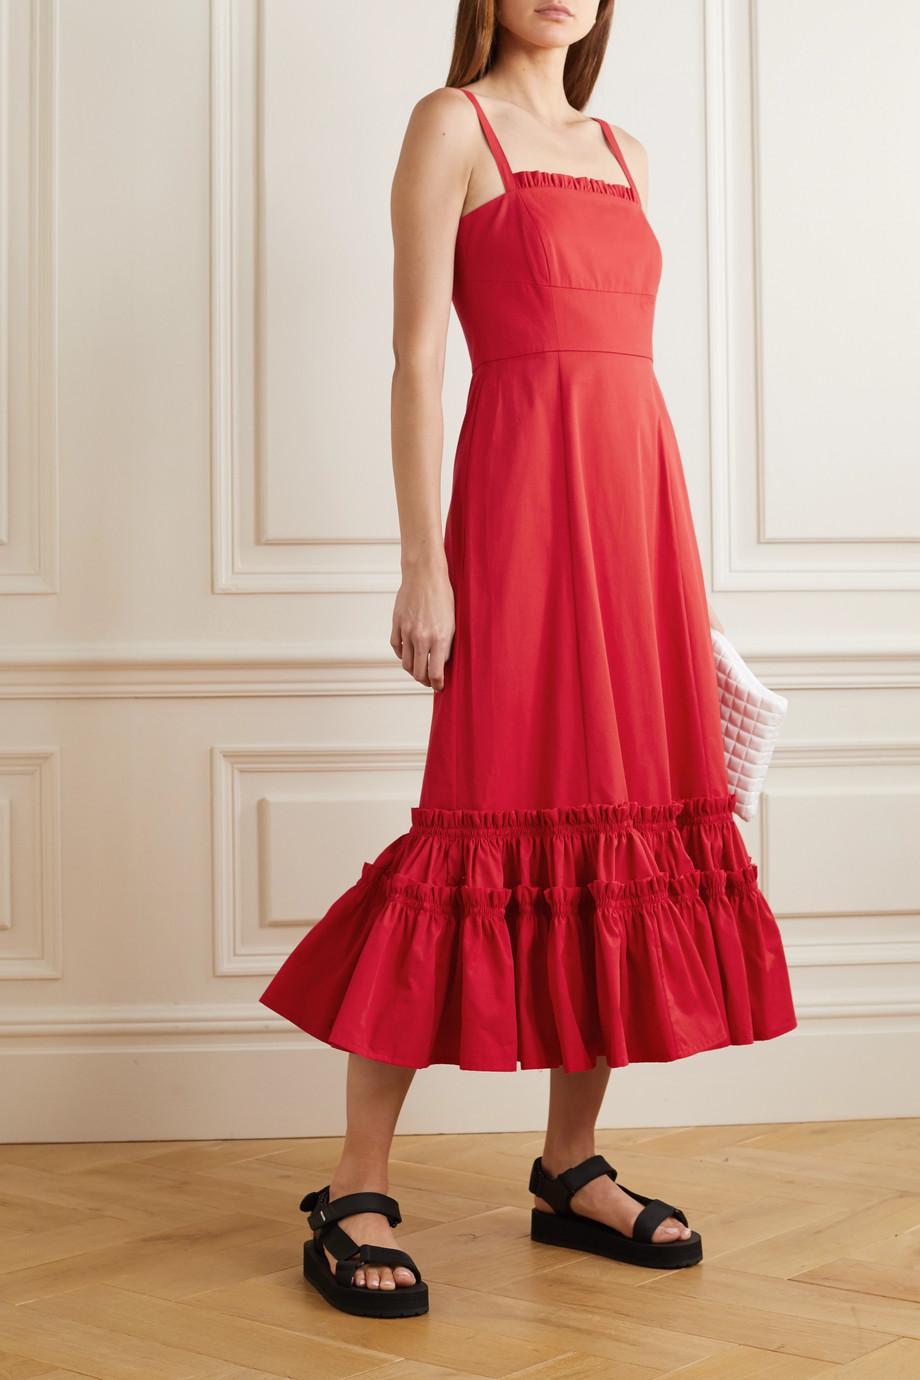 Molly Goddard Como ruffled cotton midi dress